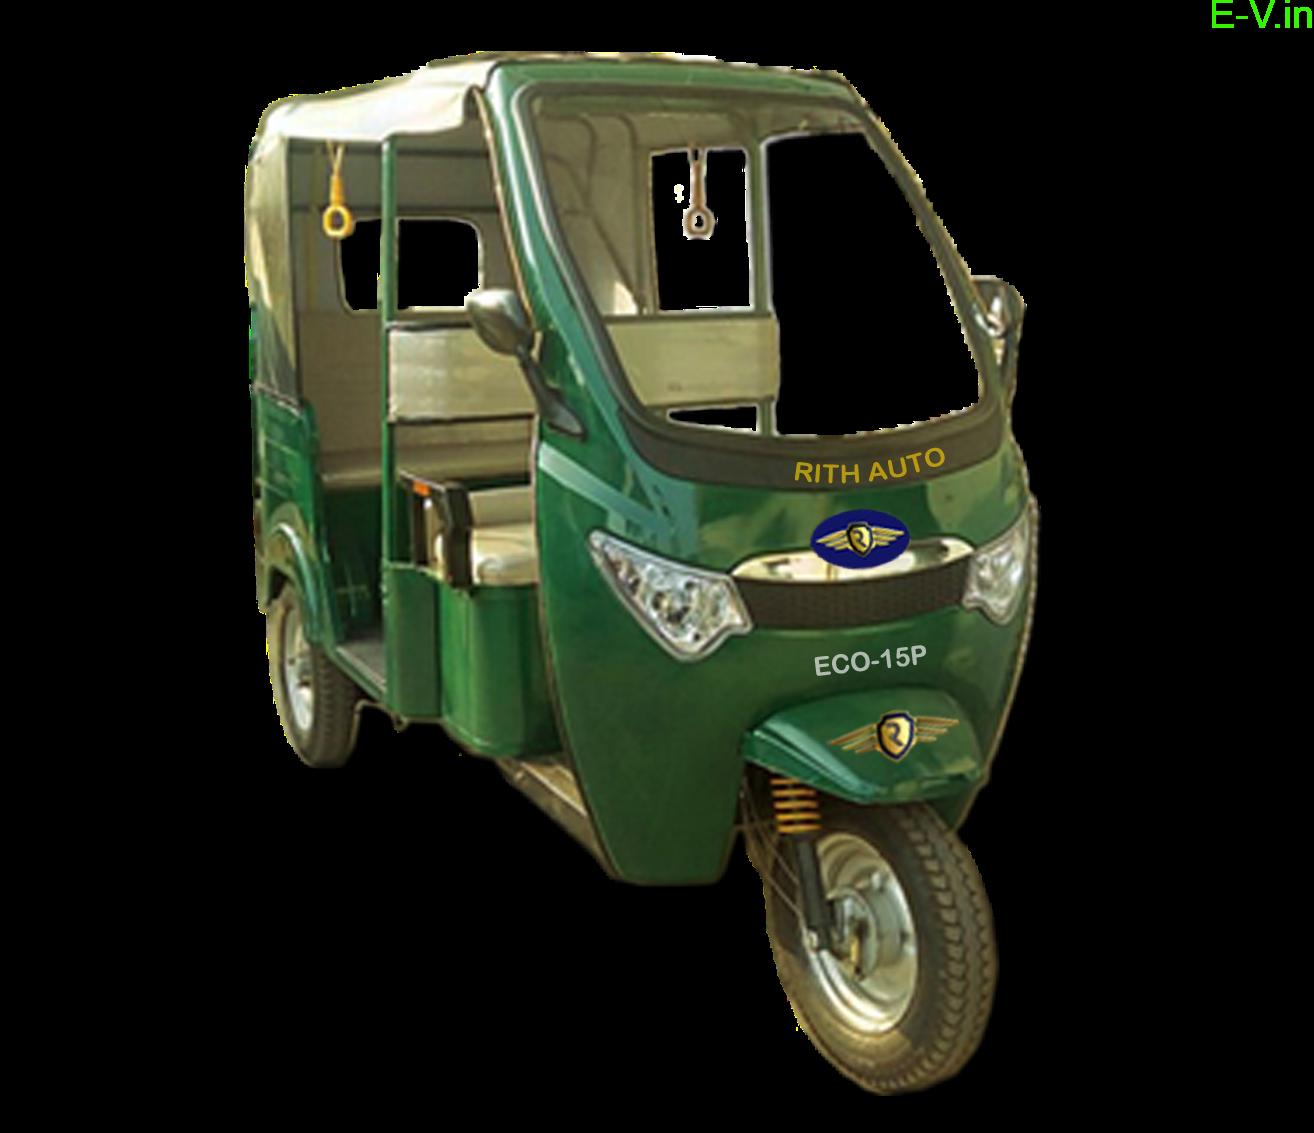 Top 8 electric auto-rickshaws in India